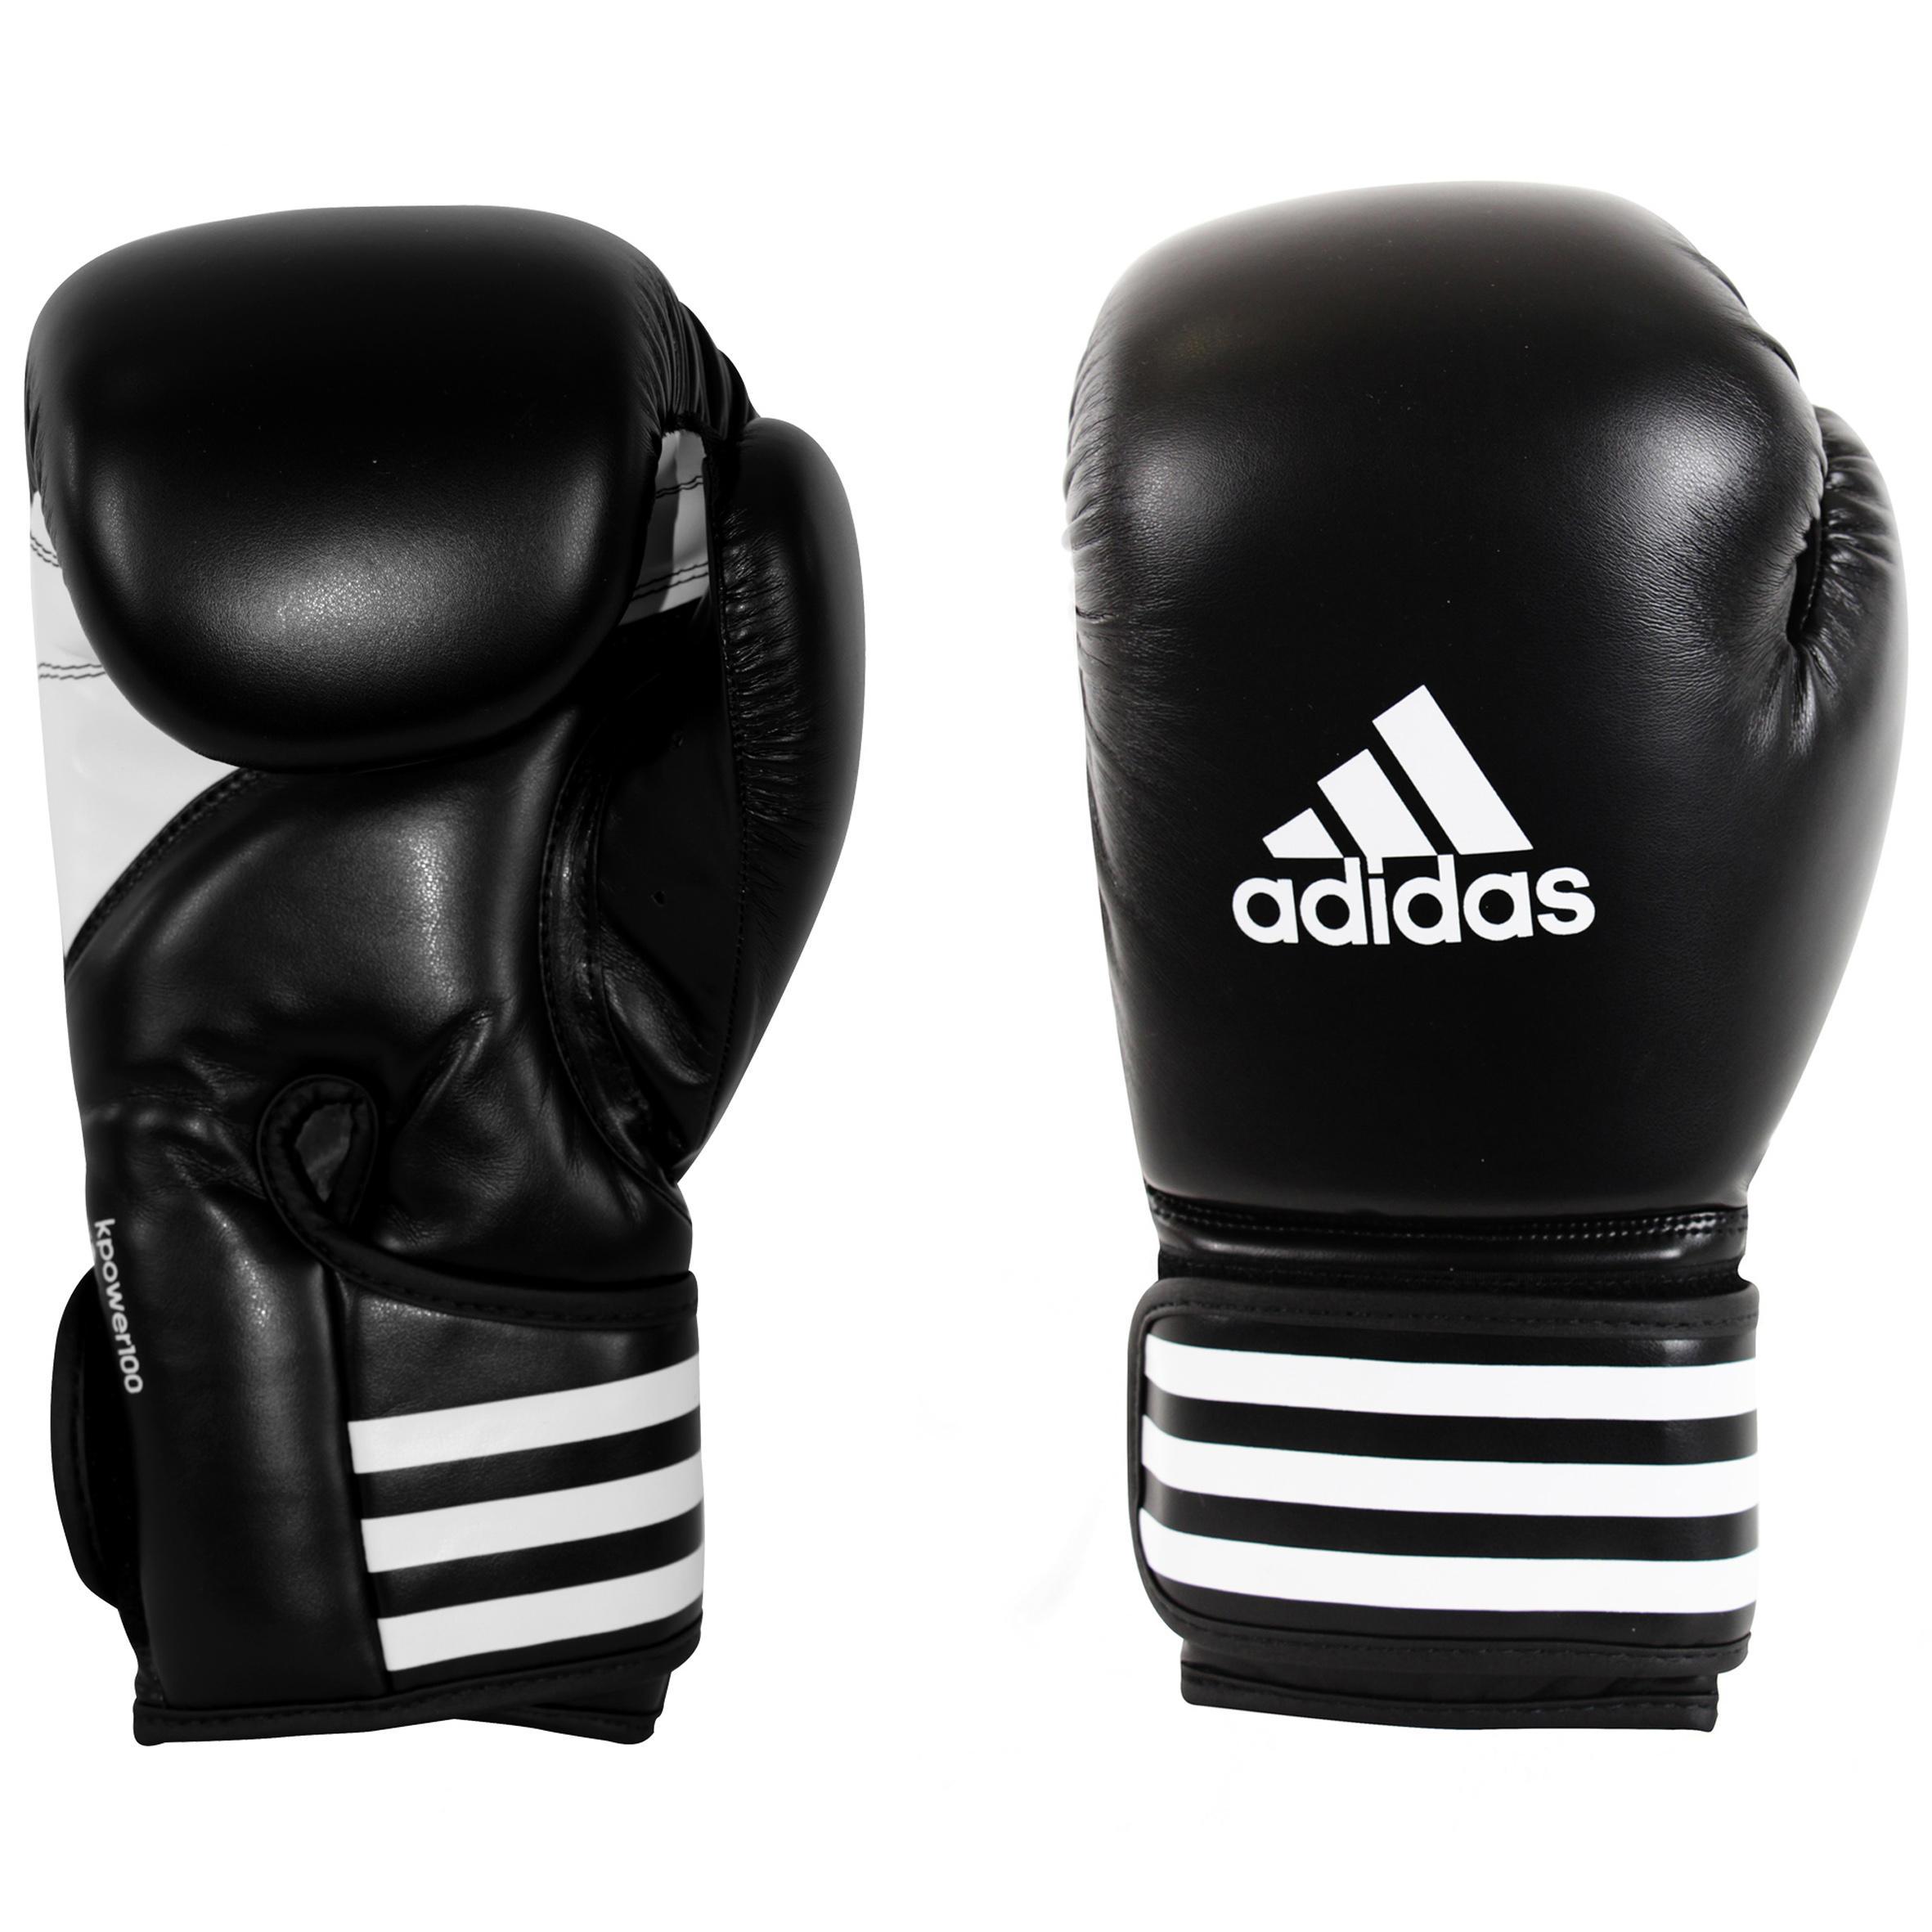 Bokshandschoenen Adidas KPower 100 zwart